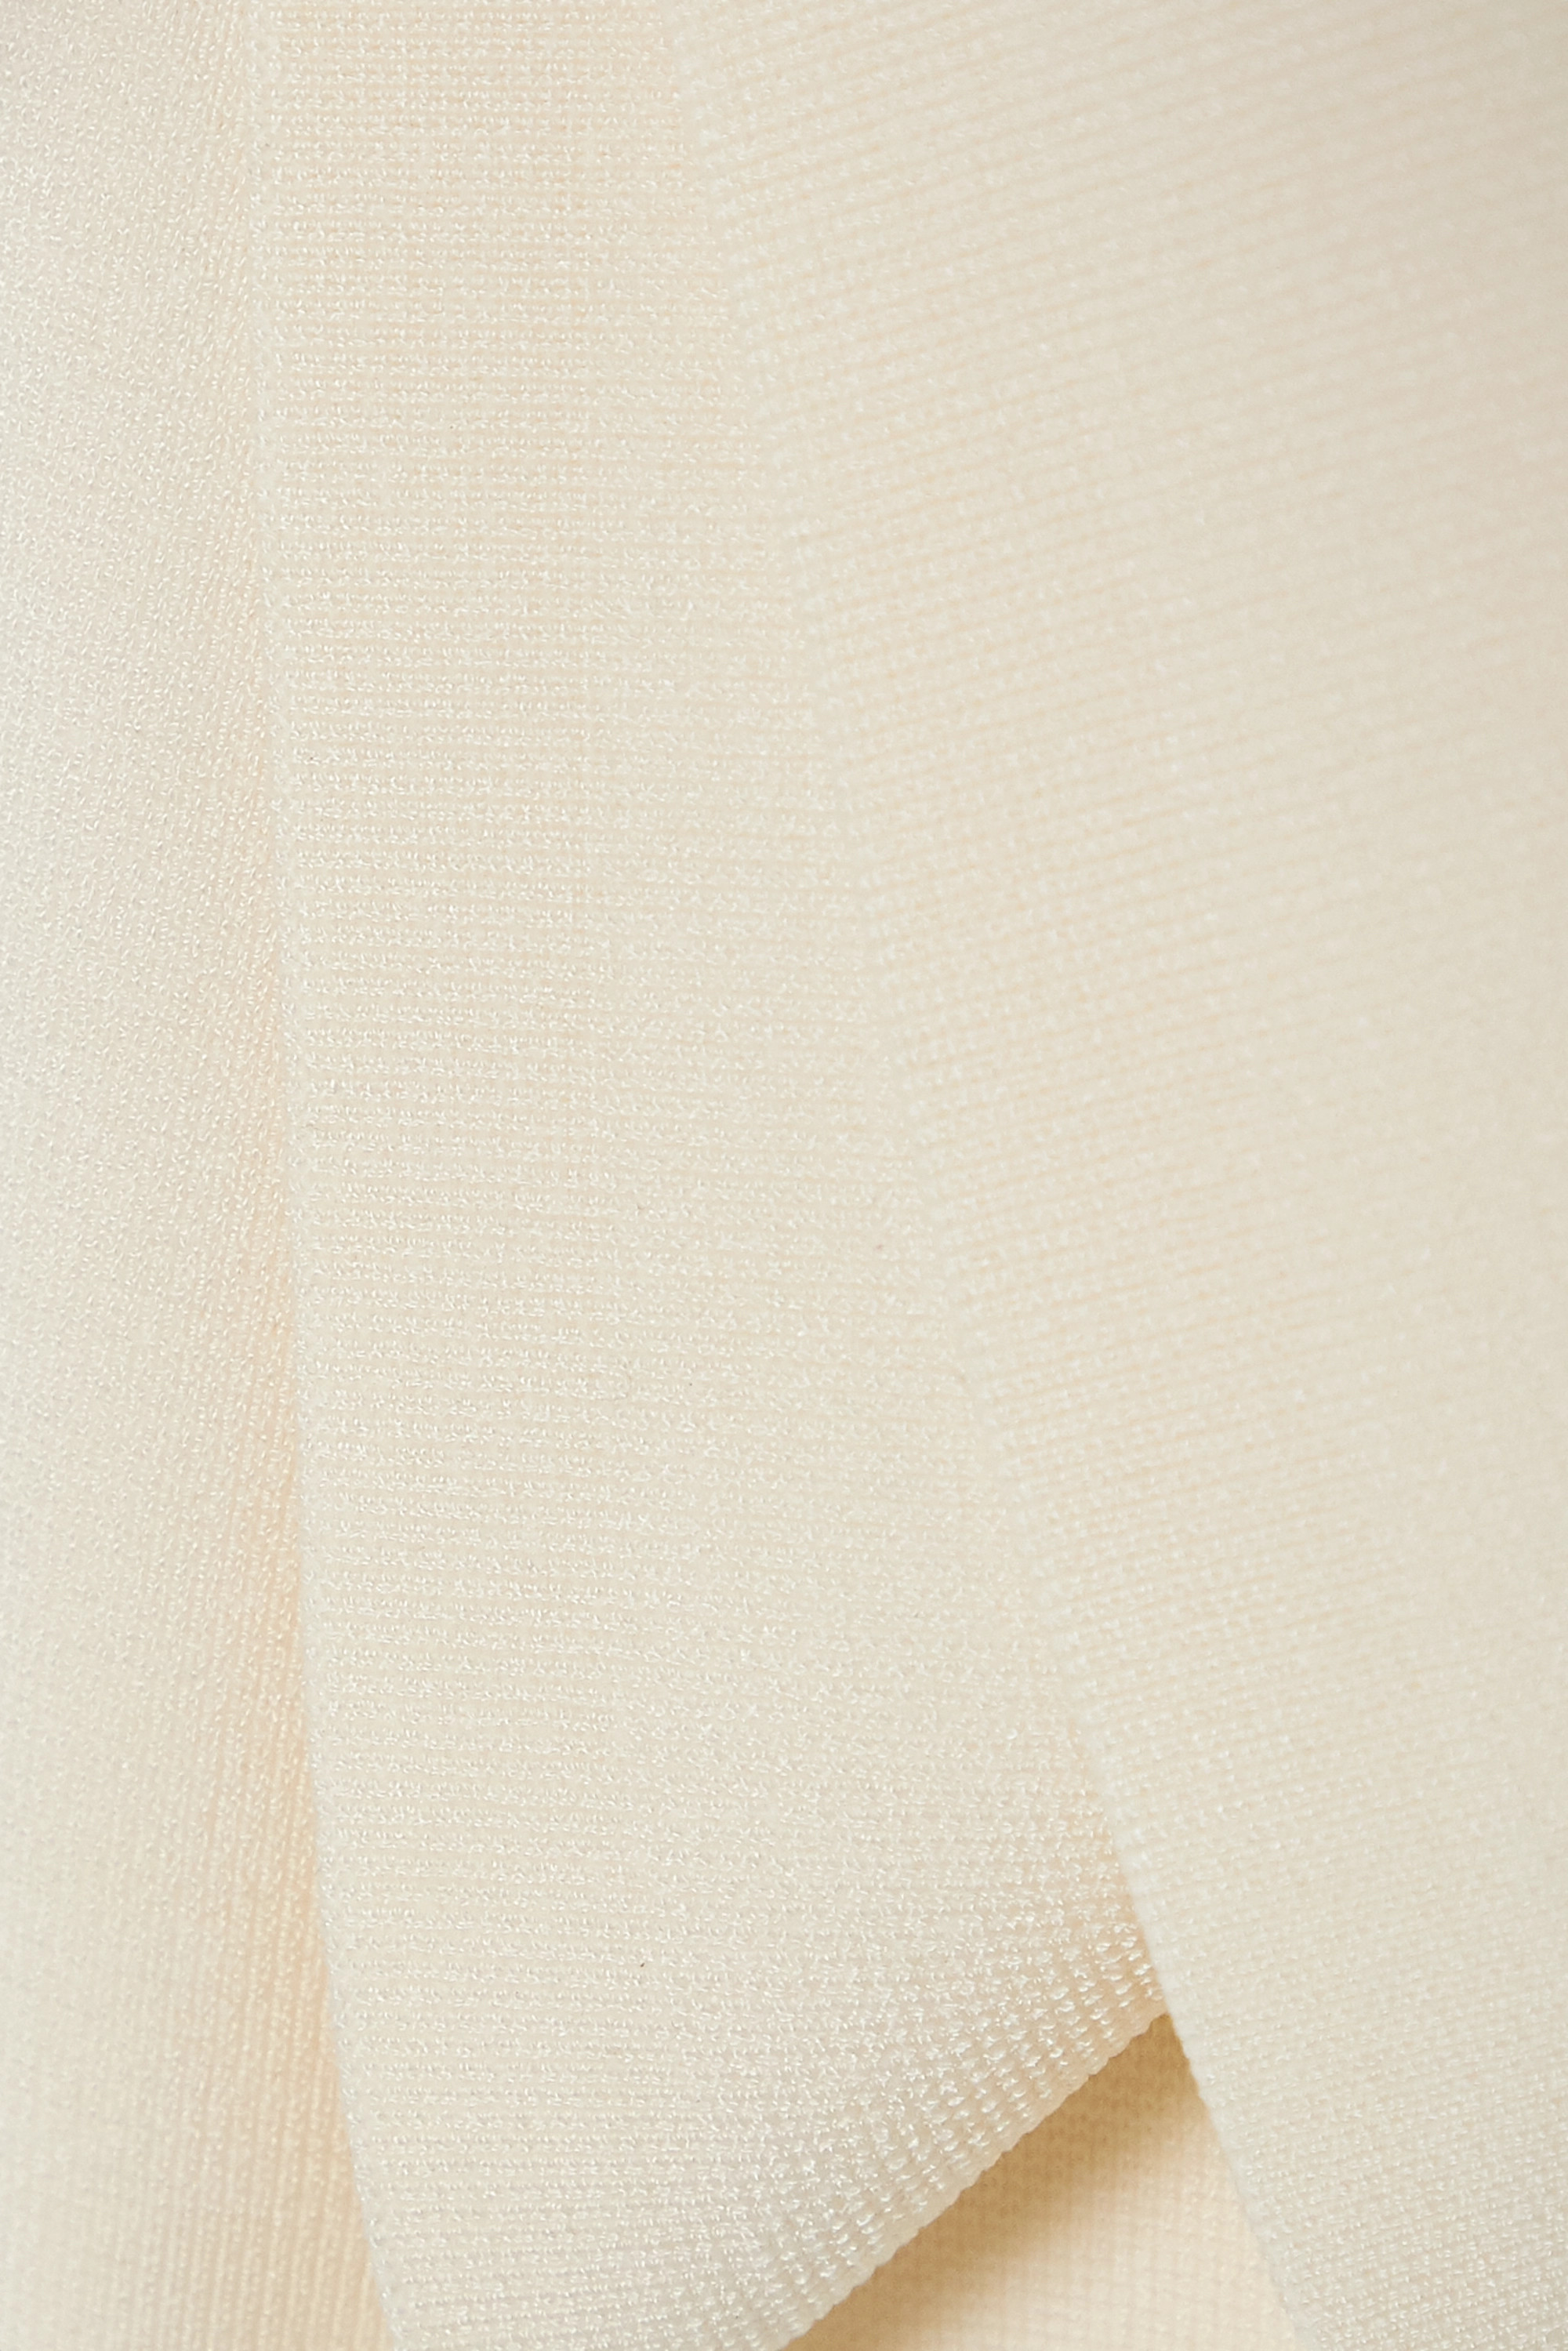 Matteau + NET SUSTAIN Nineties verkürztes Tanktop aus Stretch-Strick